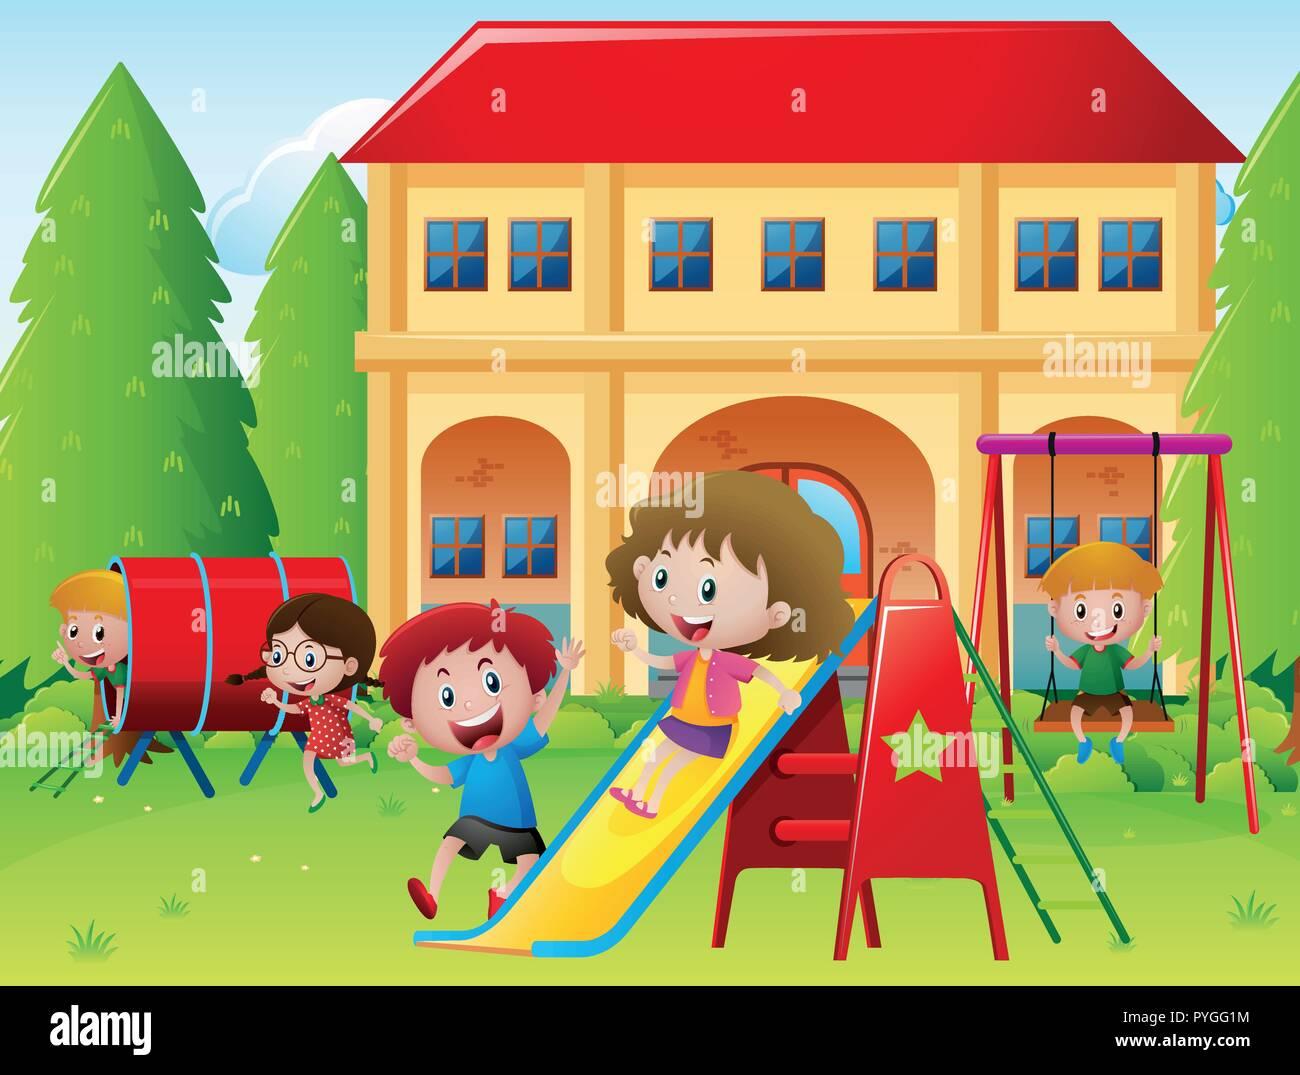 school playground stock vector images - alamy